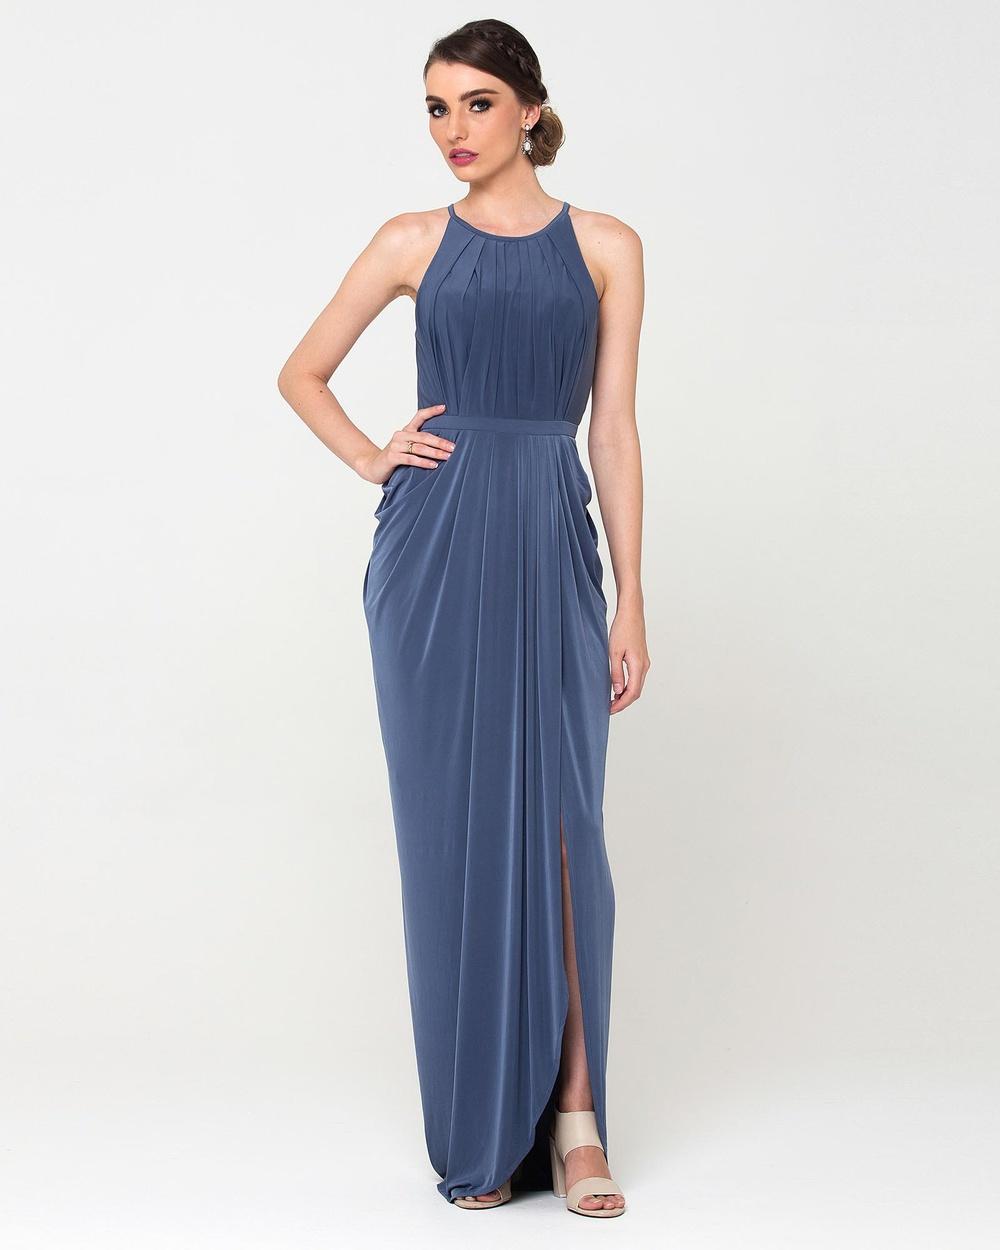 Tania Olsen Designs Sandra Dress Bridesmaid Dresses Blue Sandra Dress